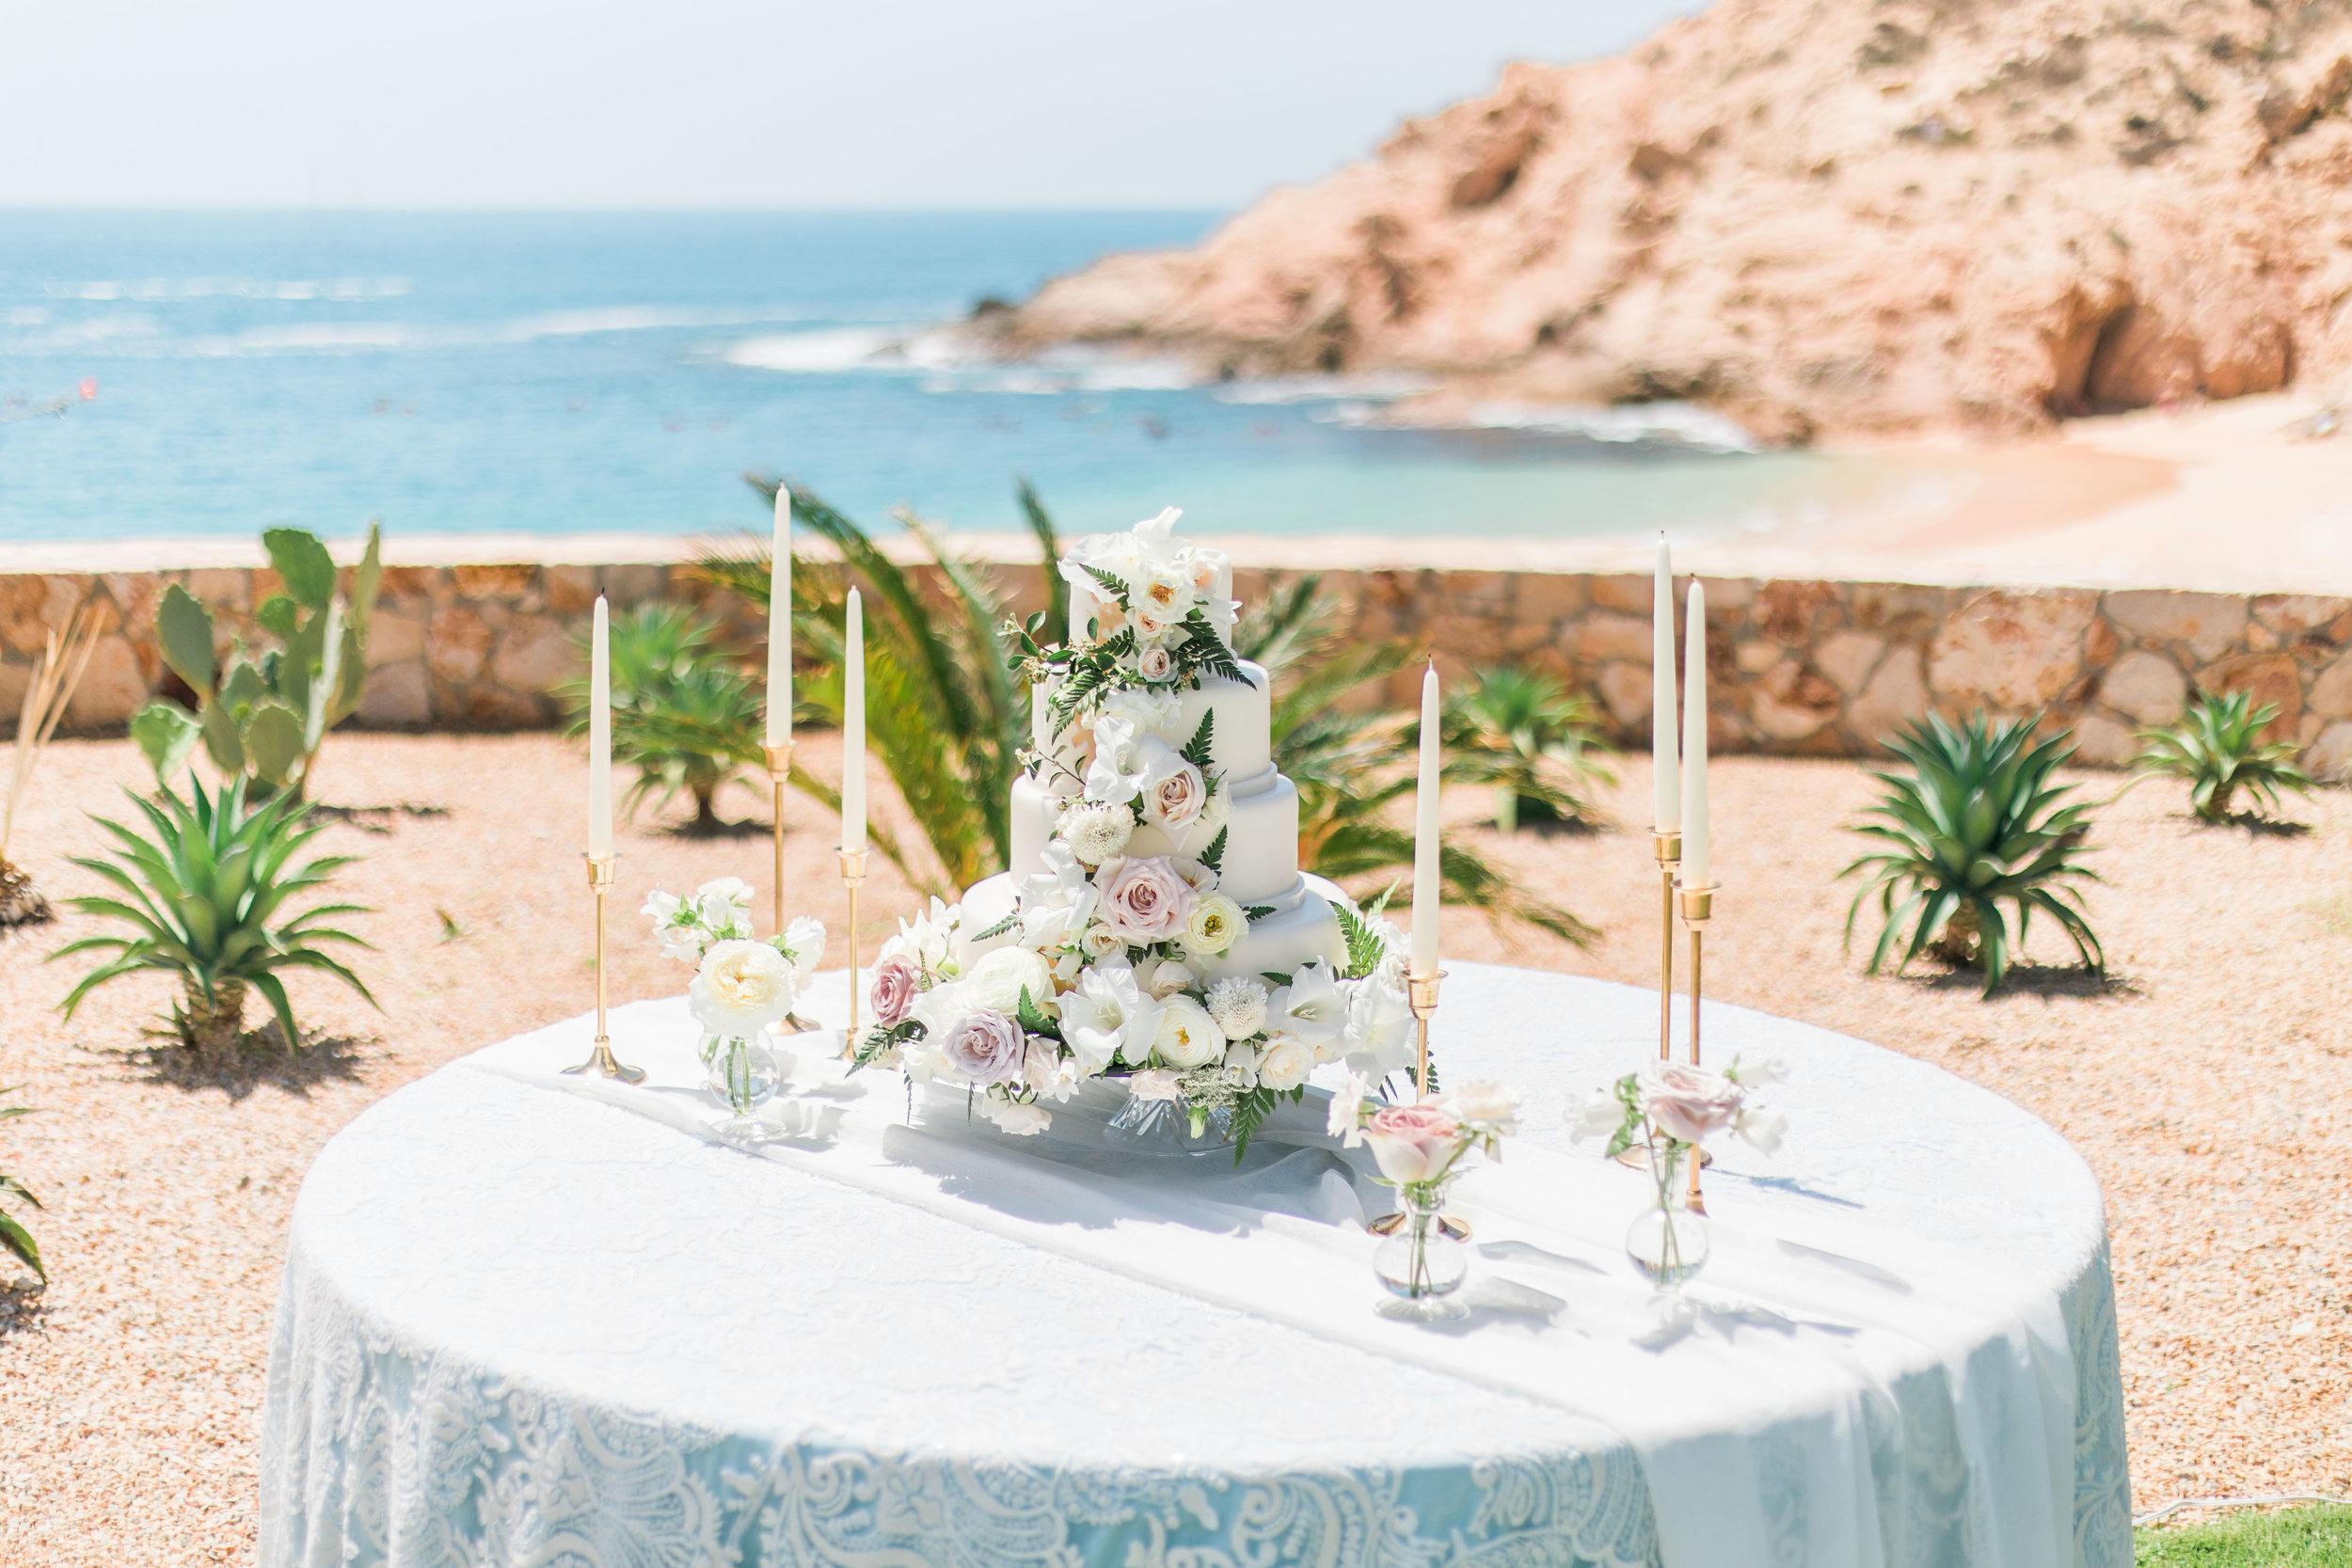 Montage-Cabo-Wedding-Photos-JBJ-Pictures-62.jpg